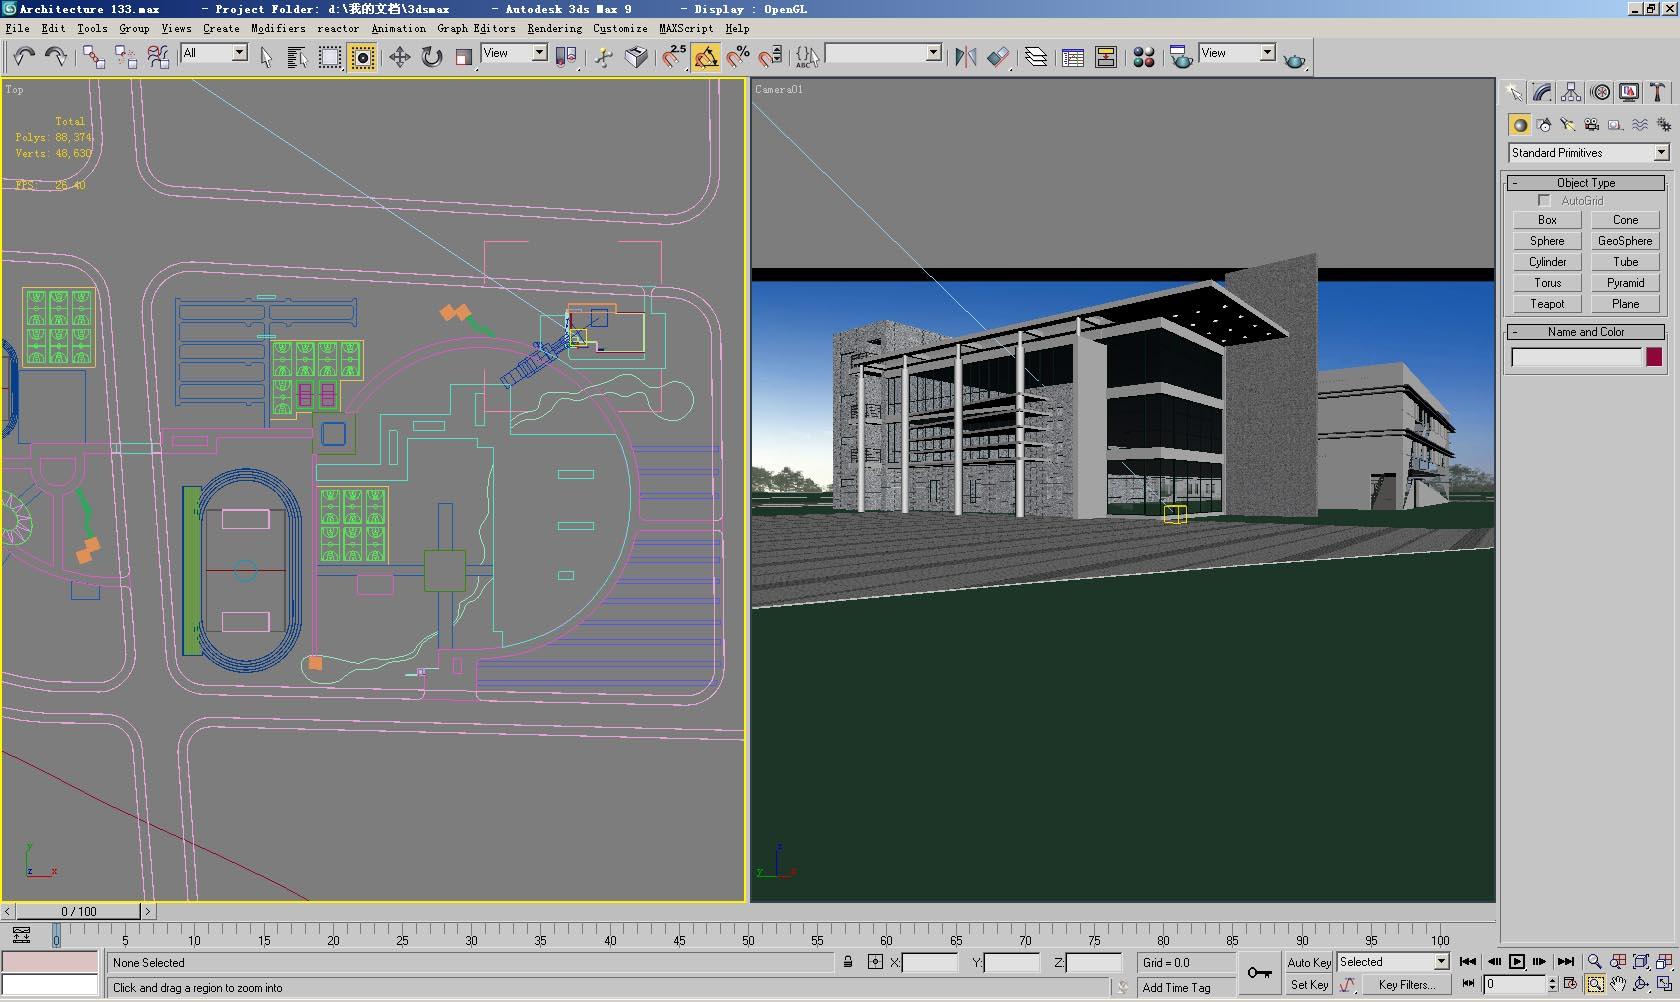 architecture 133 3d model 3ds max 142730